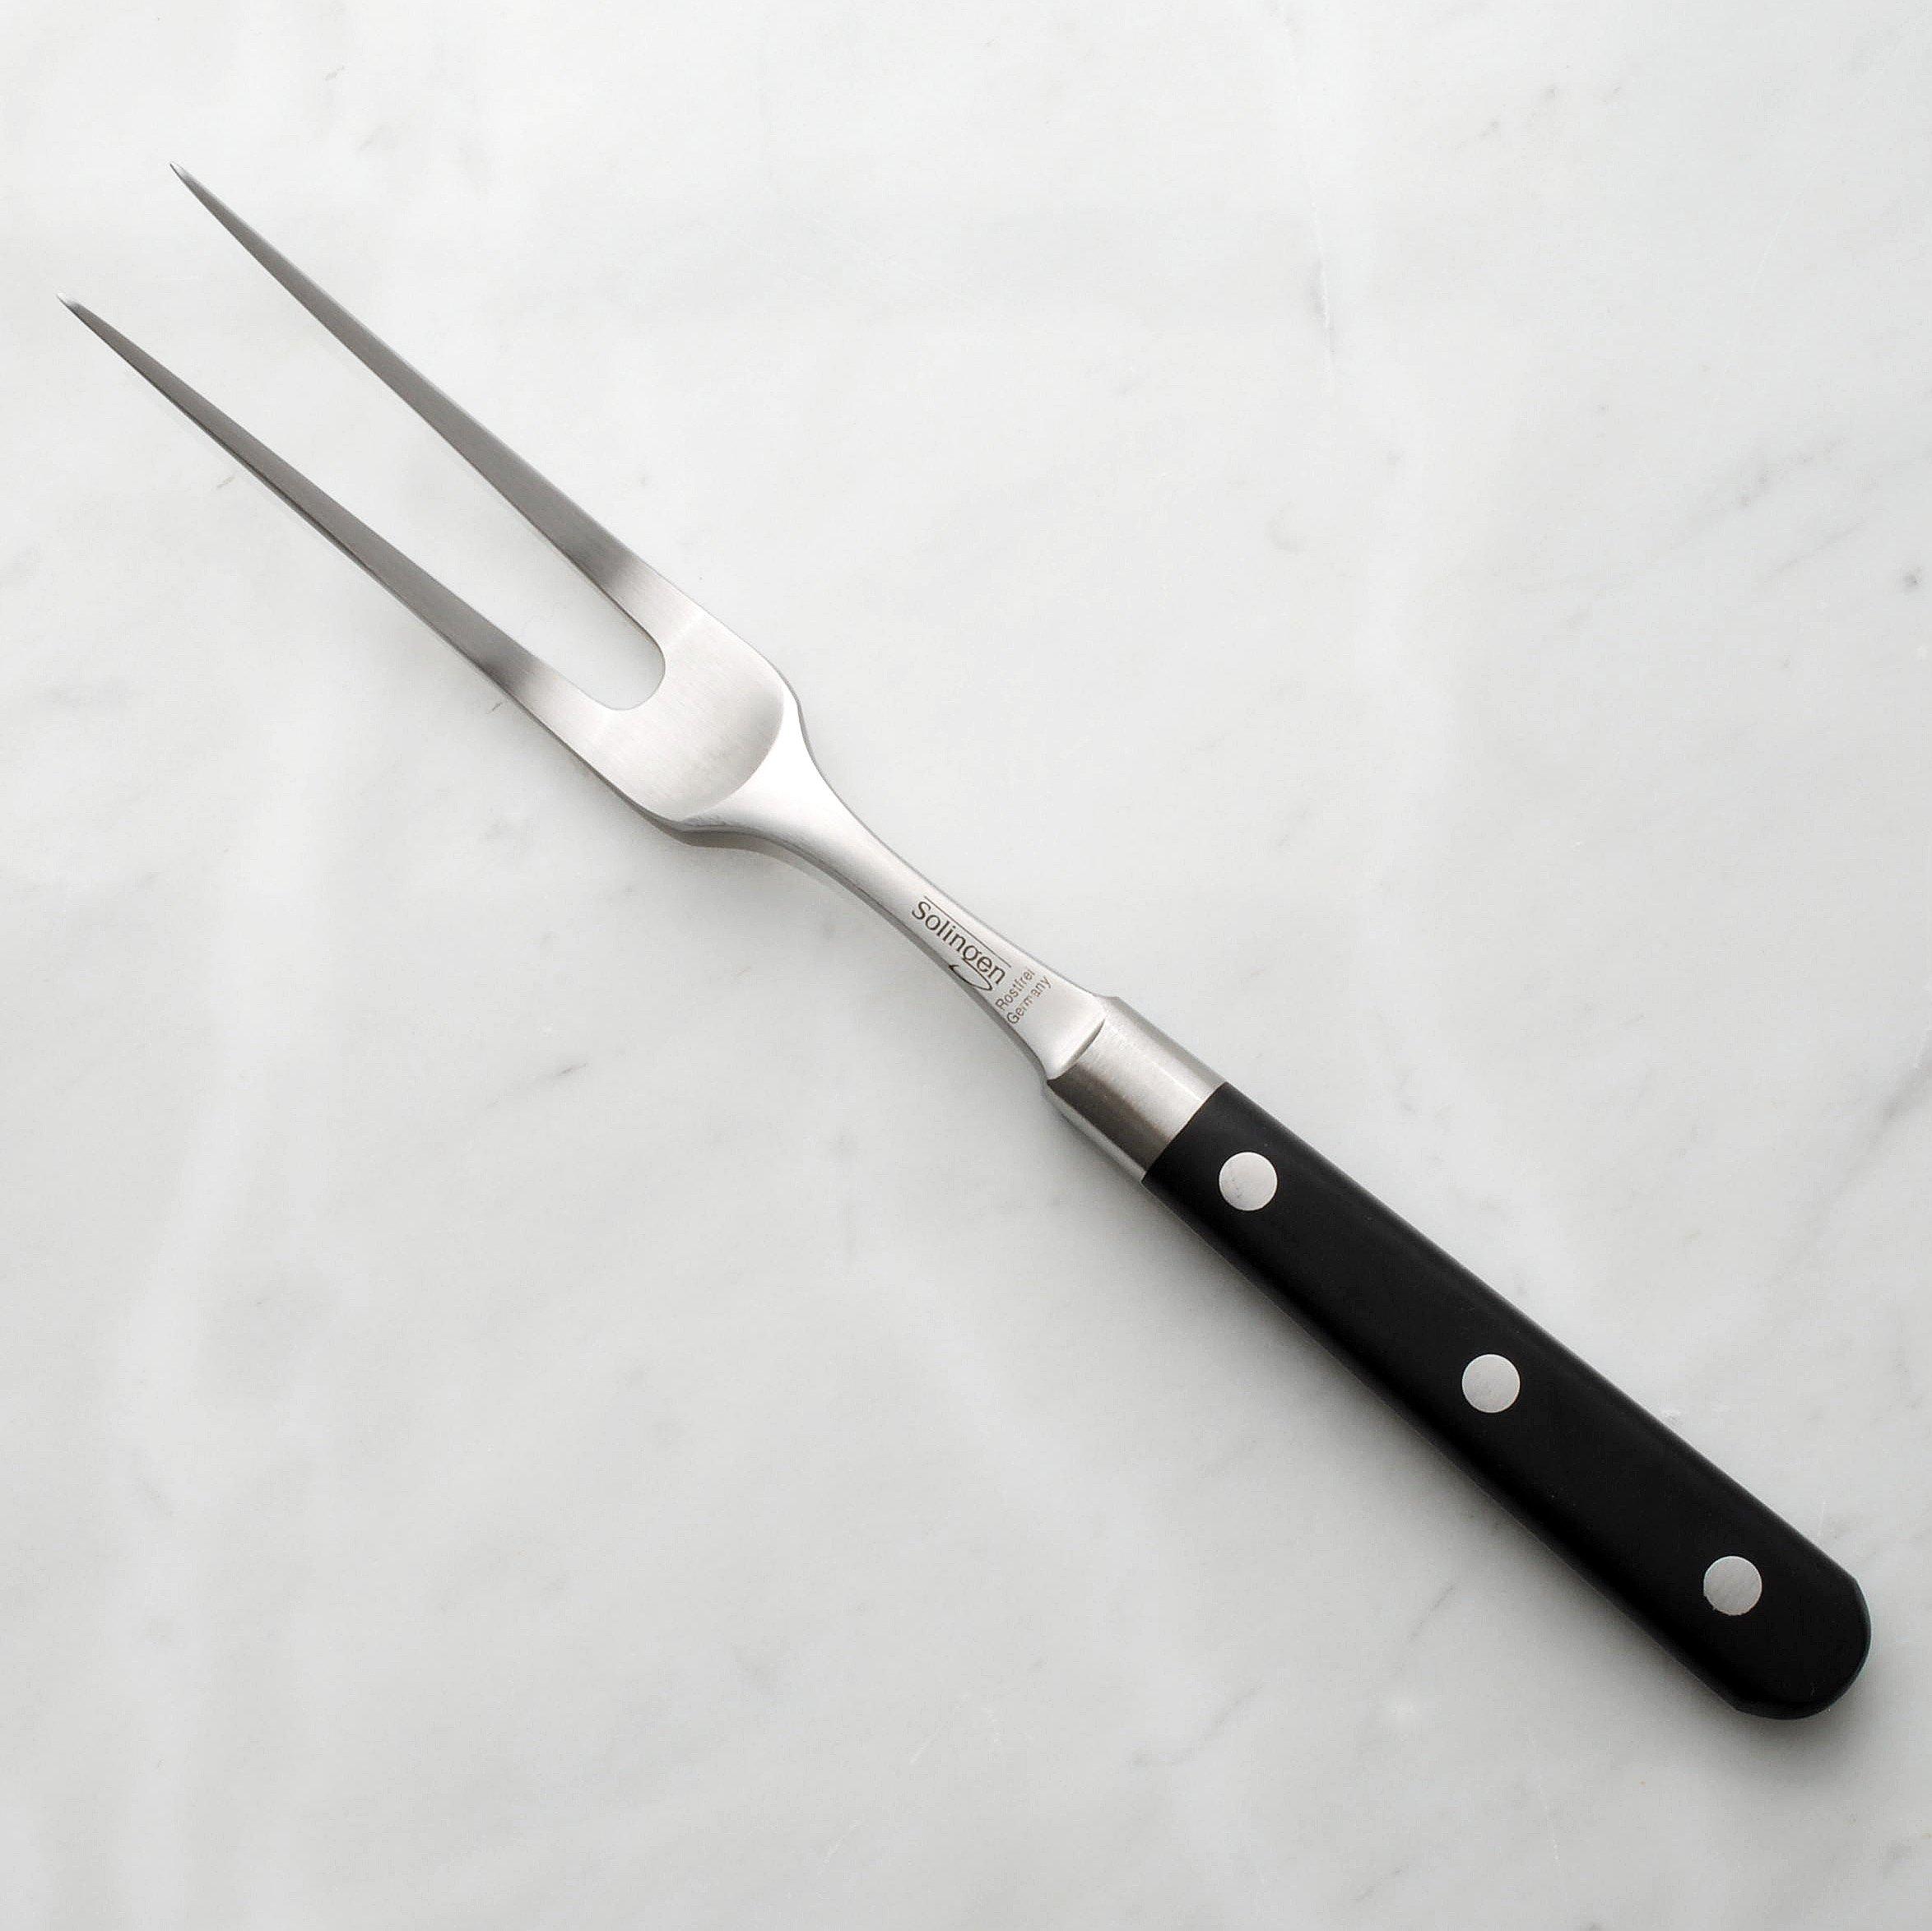 Messermeister Meridian Elite Curved Pot Fork by Messermeister (Image #2)